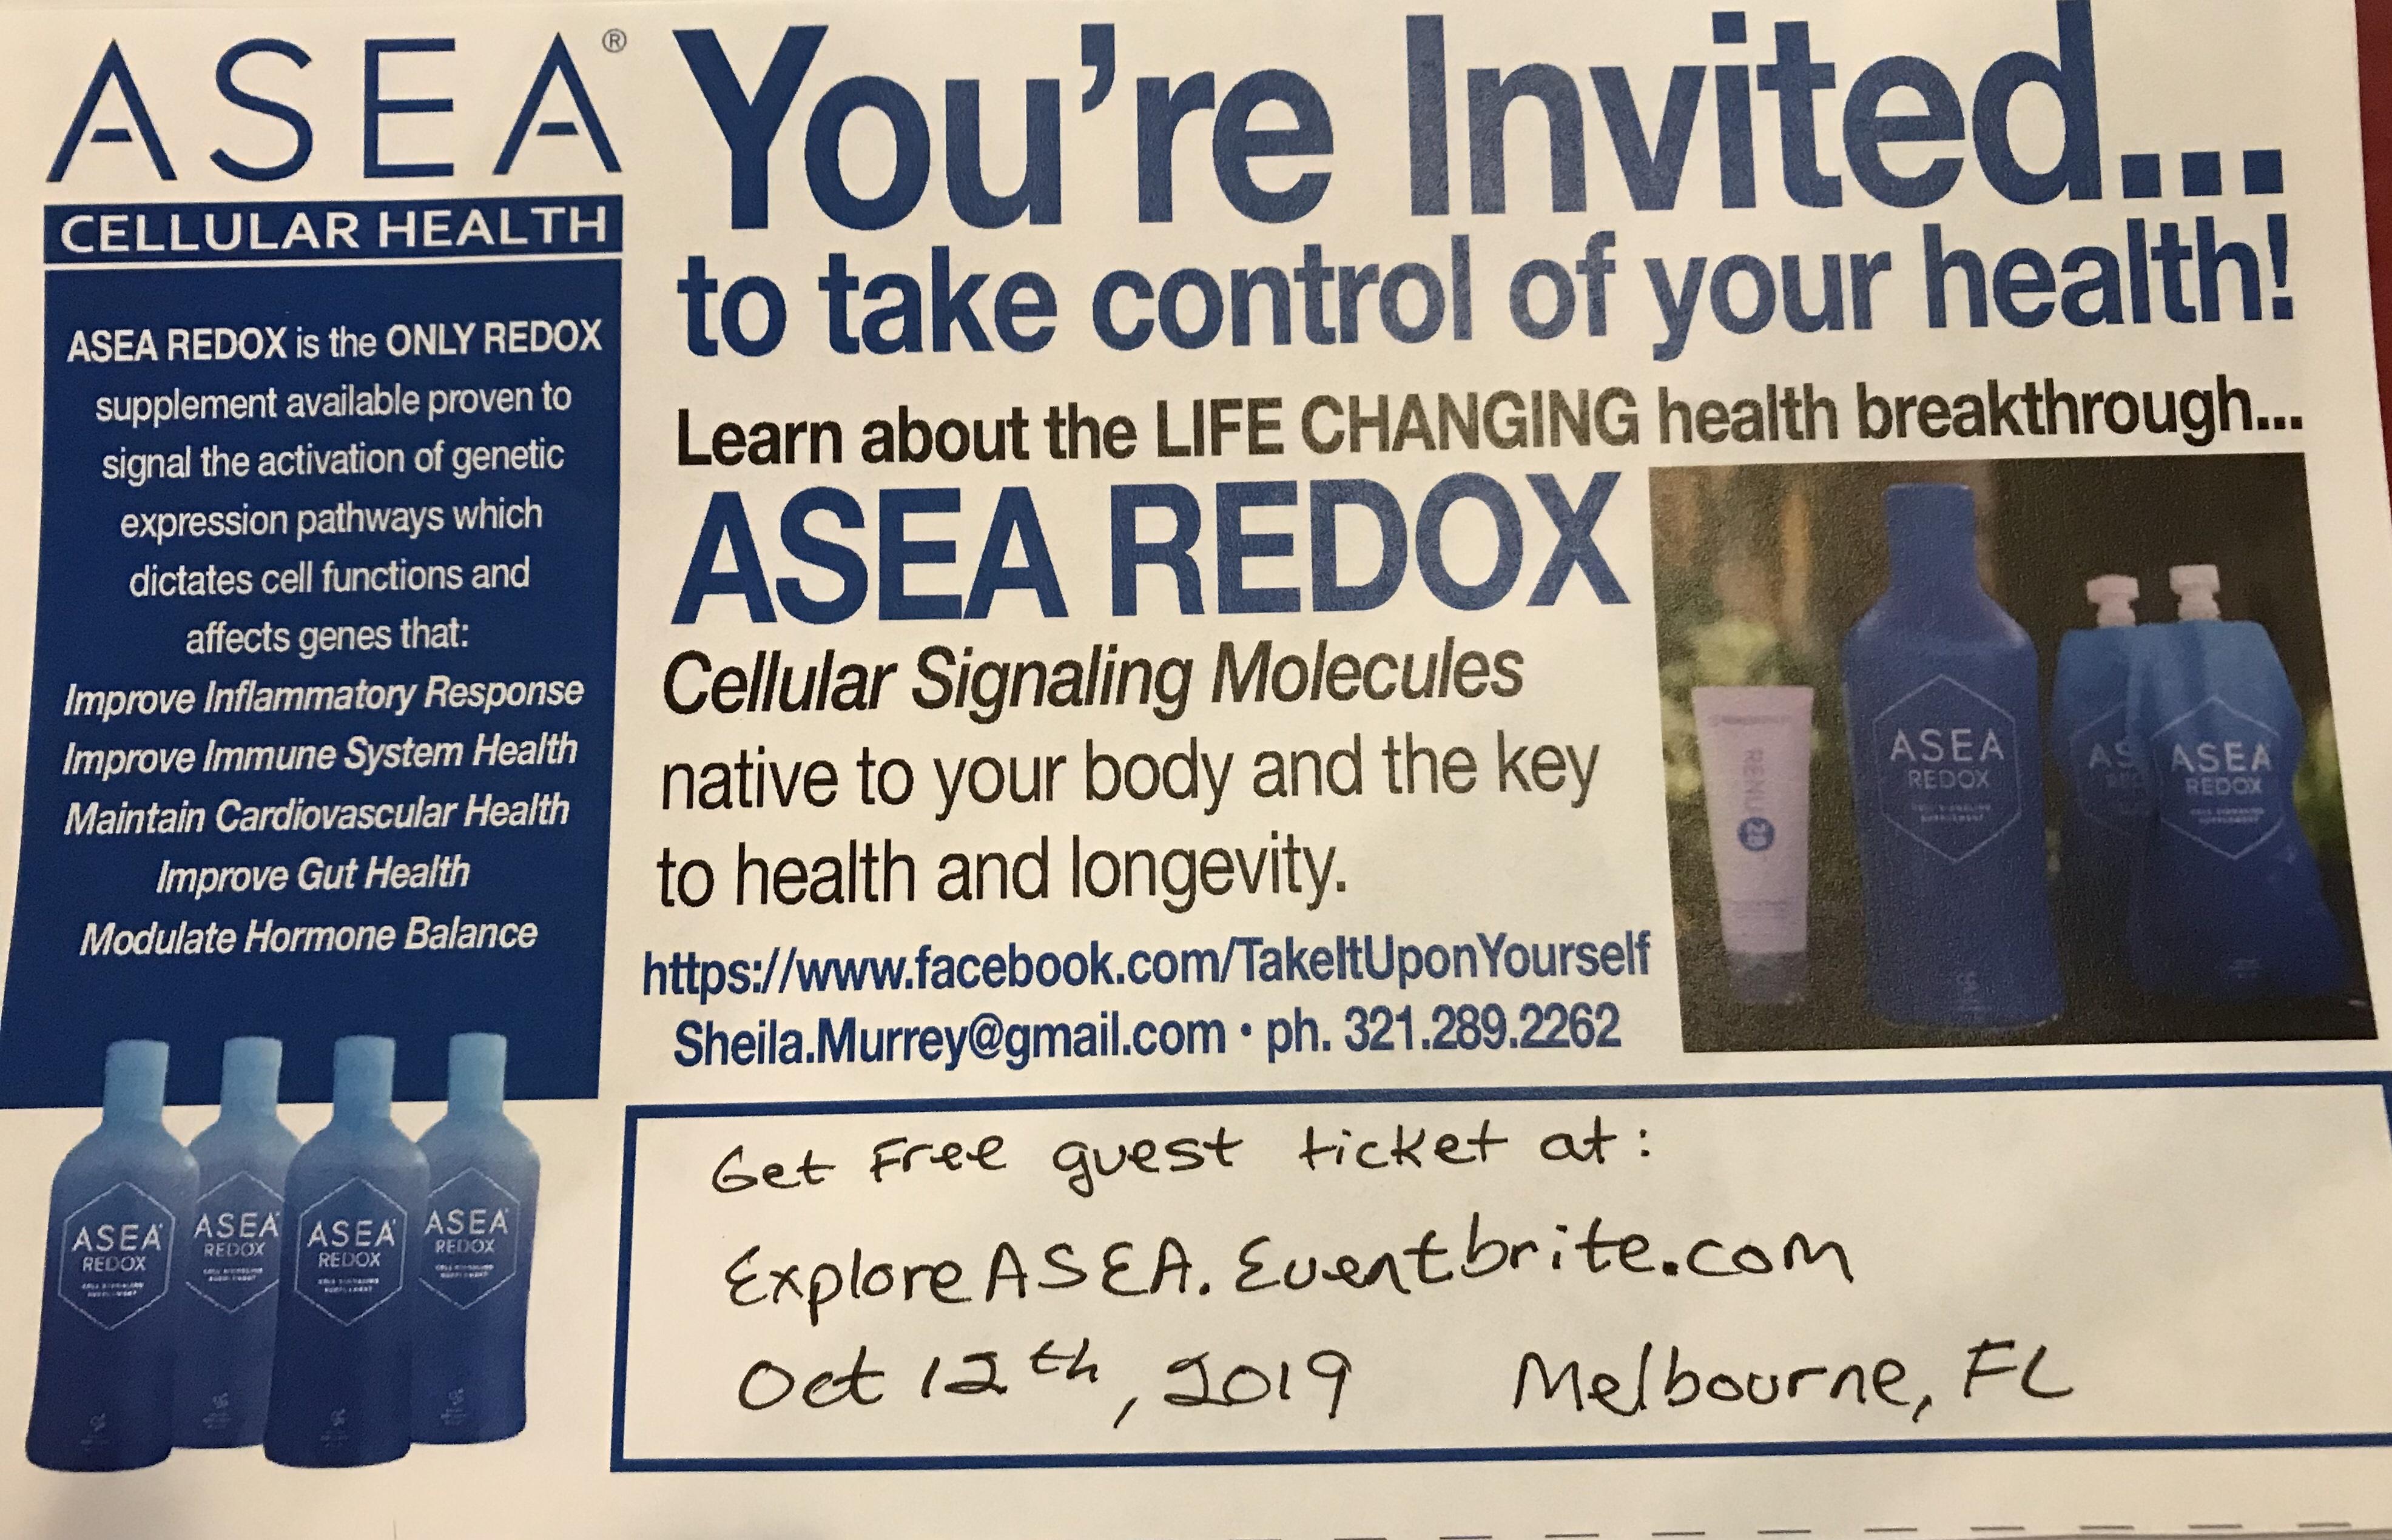 Your invitation - Melbourne FL Saturday October 12, 2019